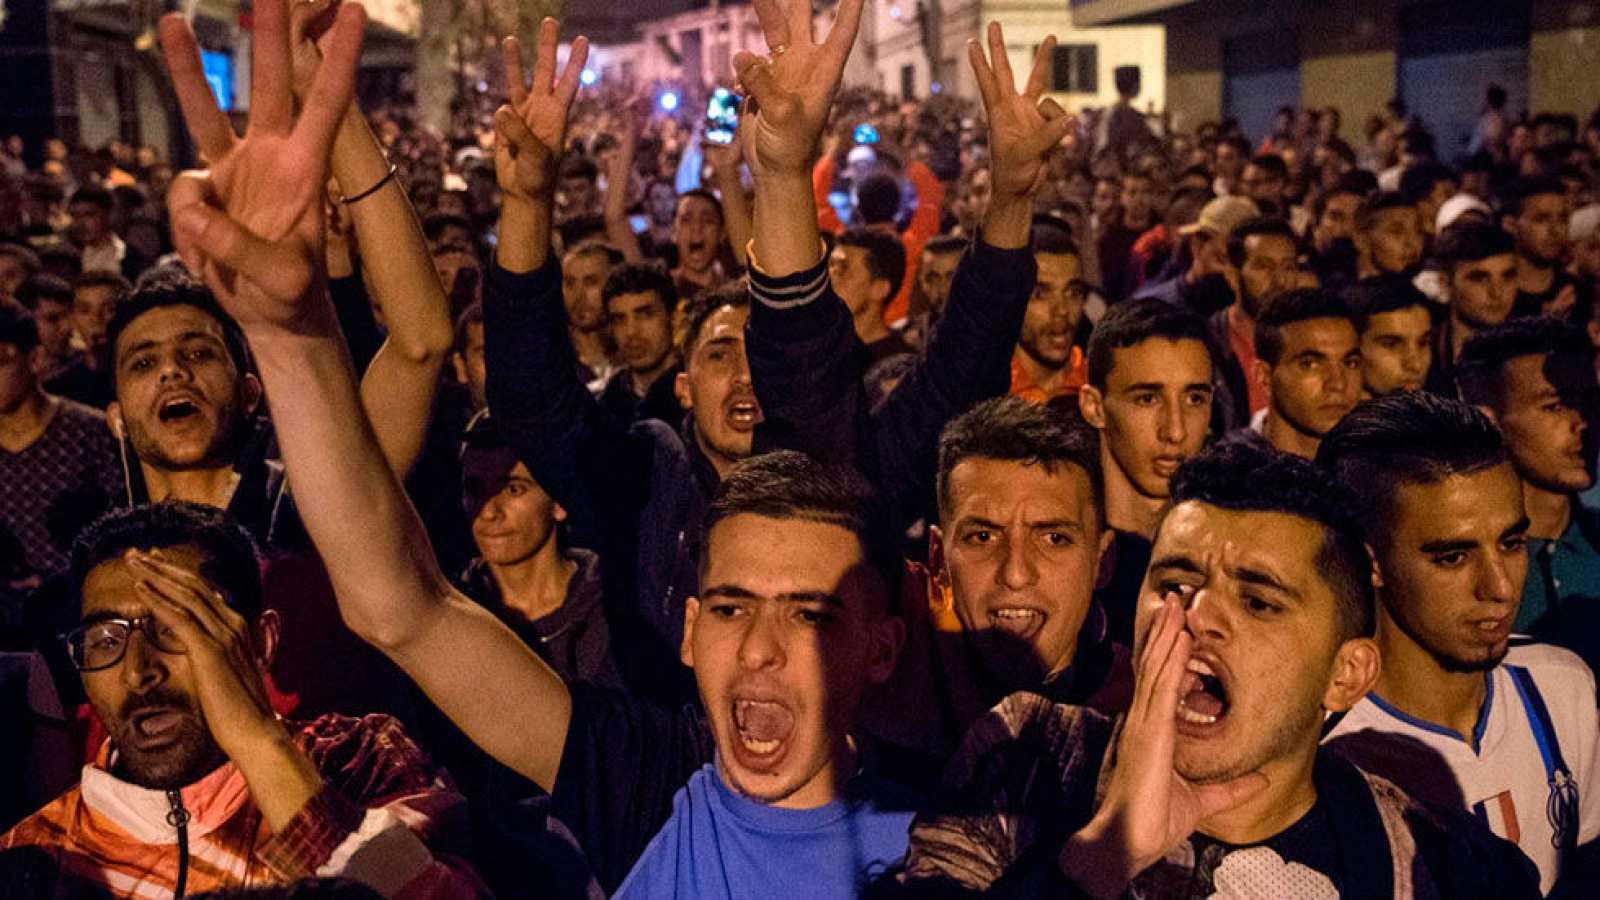 Reportajes 5 Continentes - Los refugiados de El Rif - 19/10/18 - Escuchar ahora